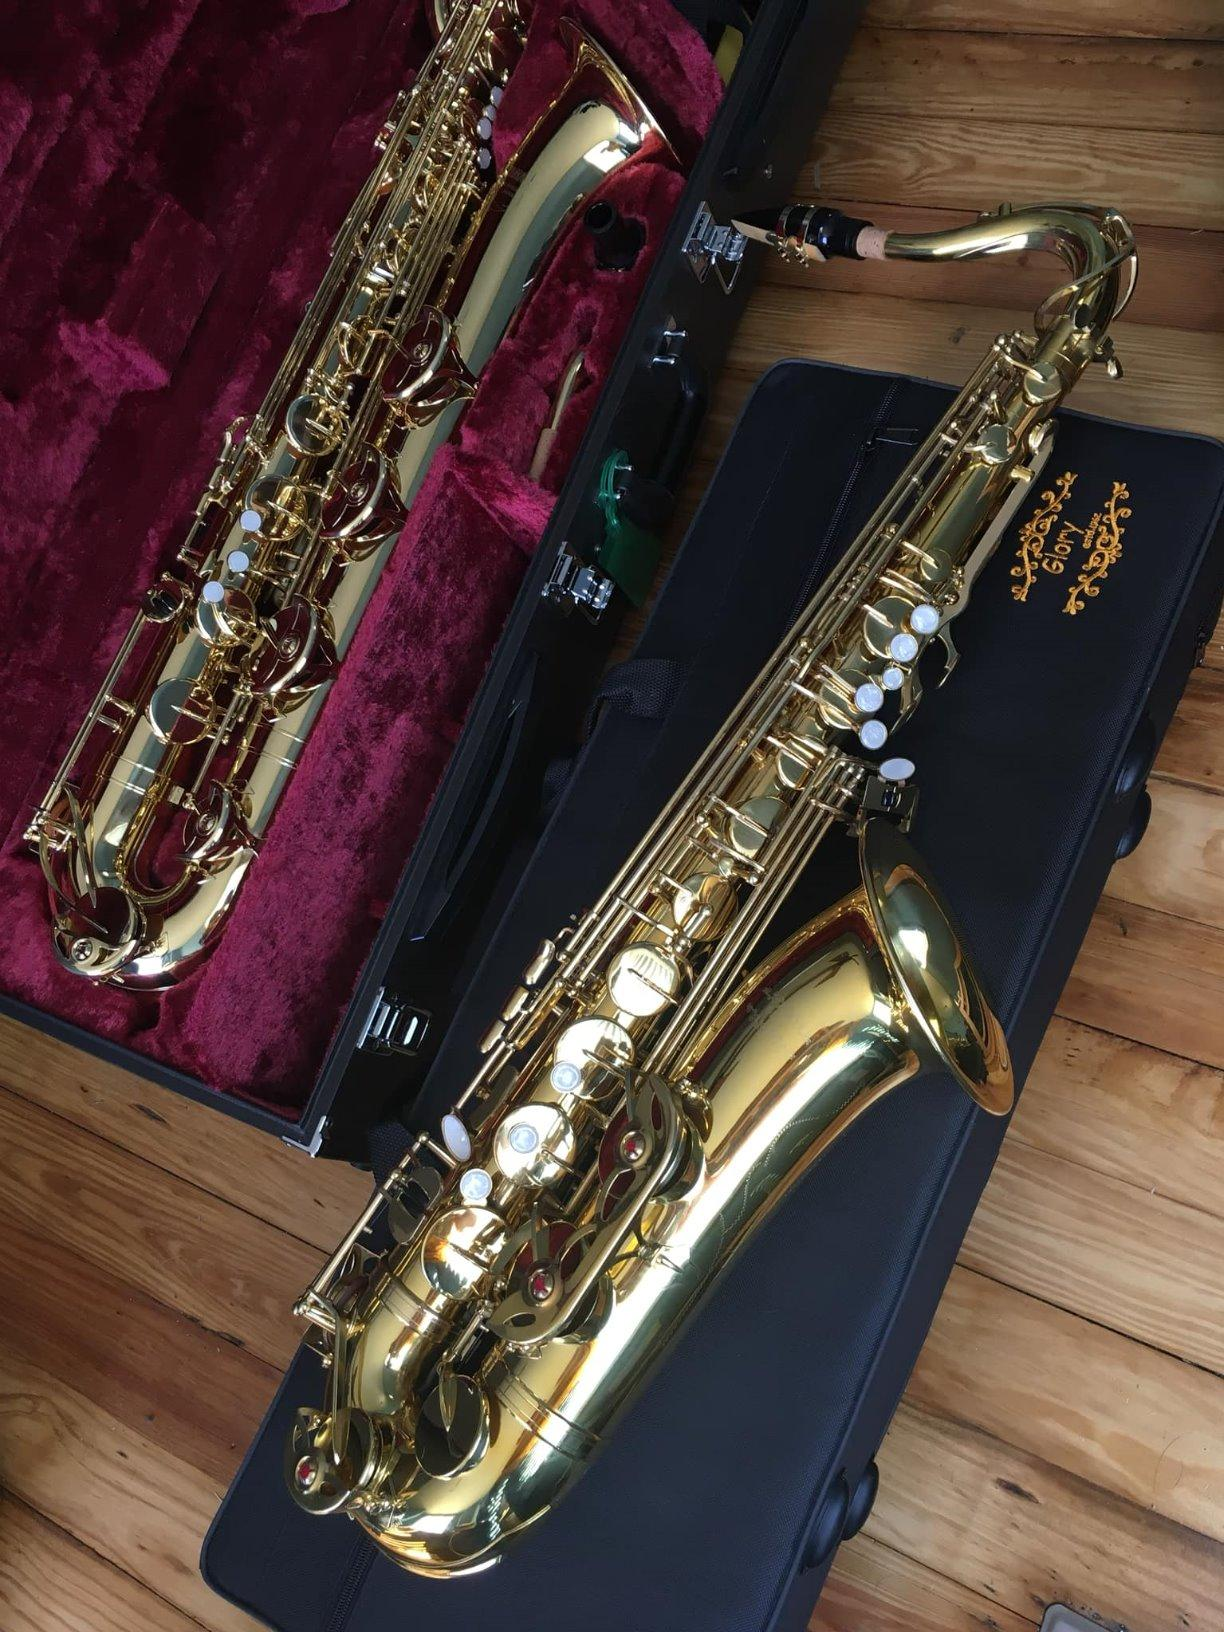 Glory Nickel /Gold B Flat Tenor Saxophone with Case,10pc